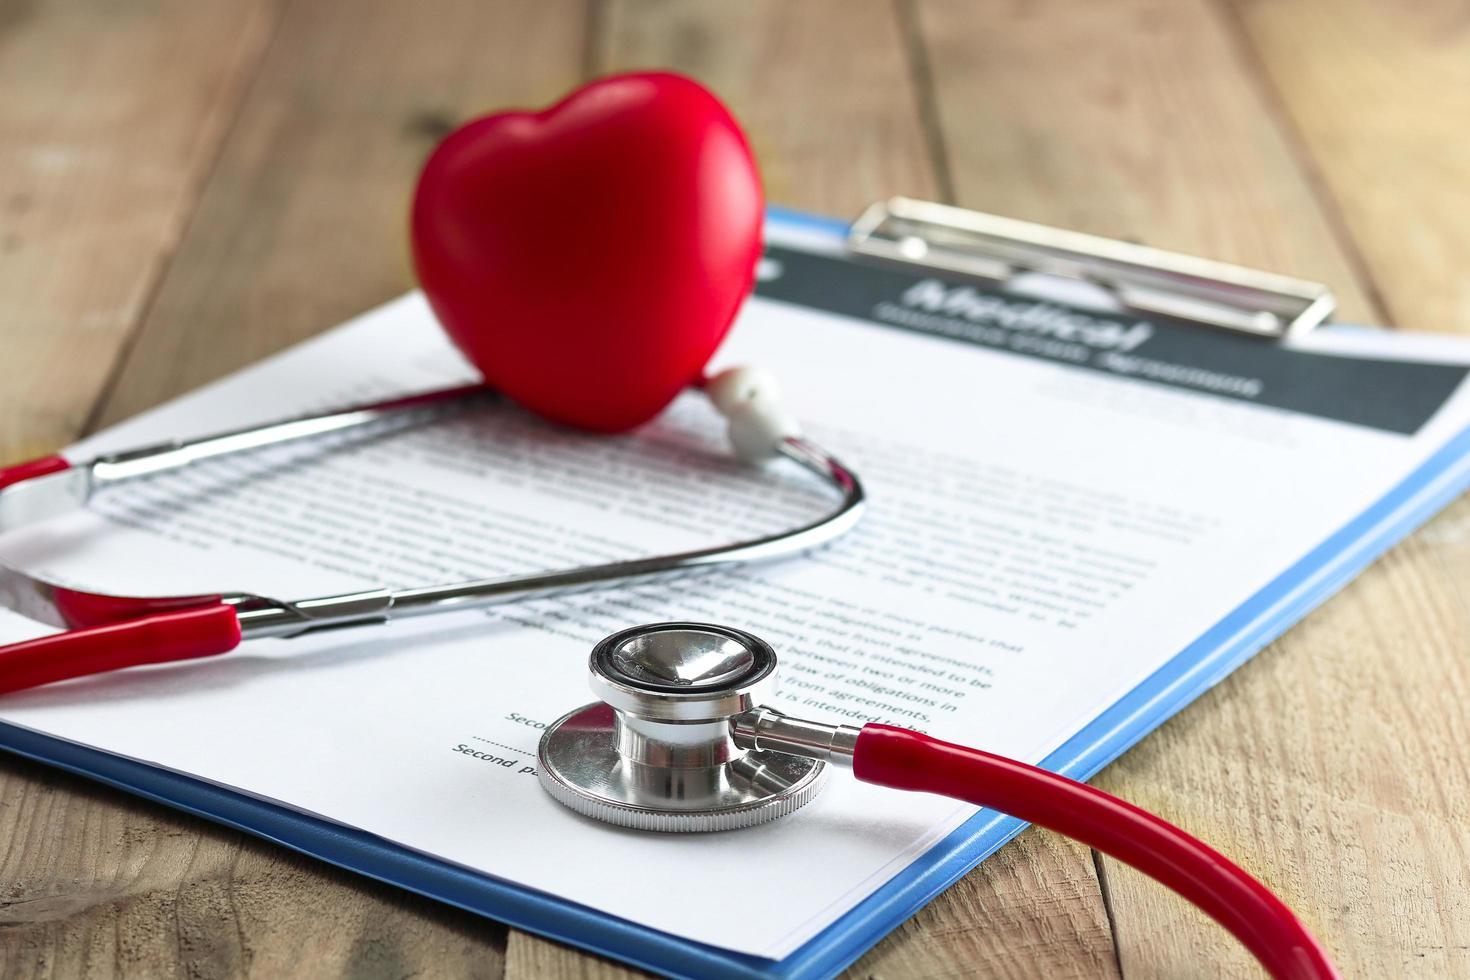 rode stethoscoop en hart op klembord foto